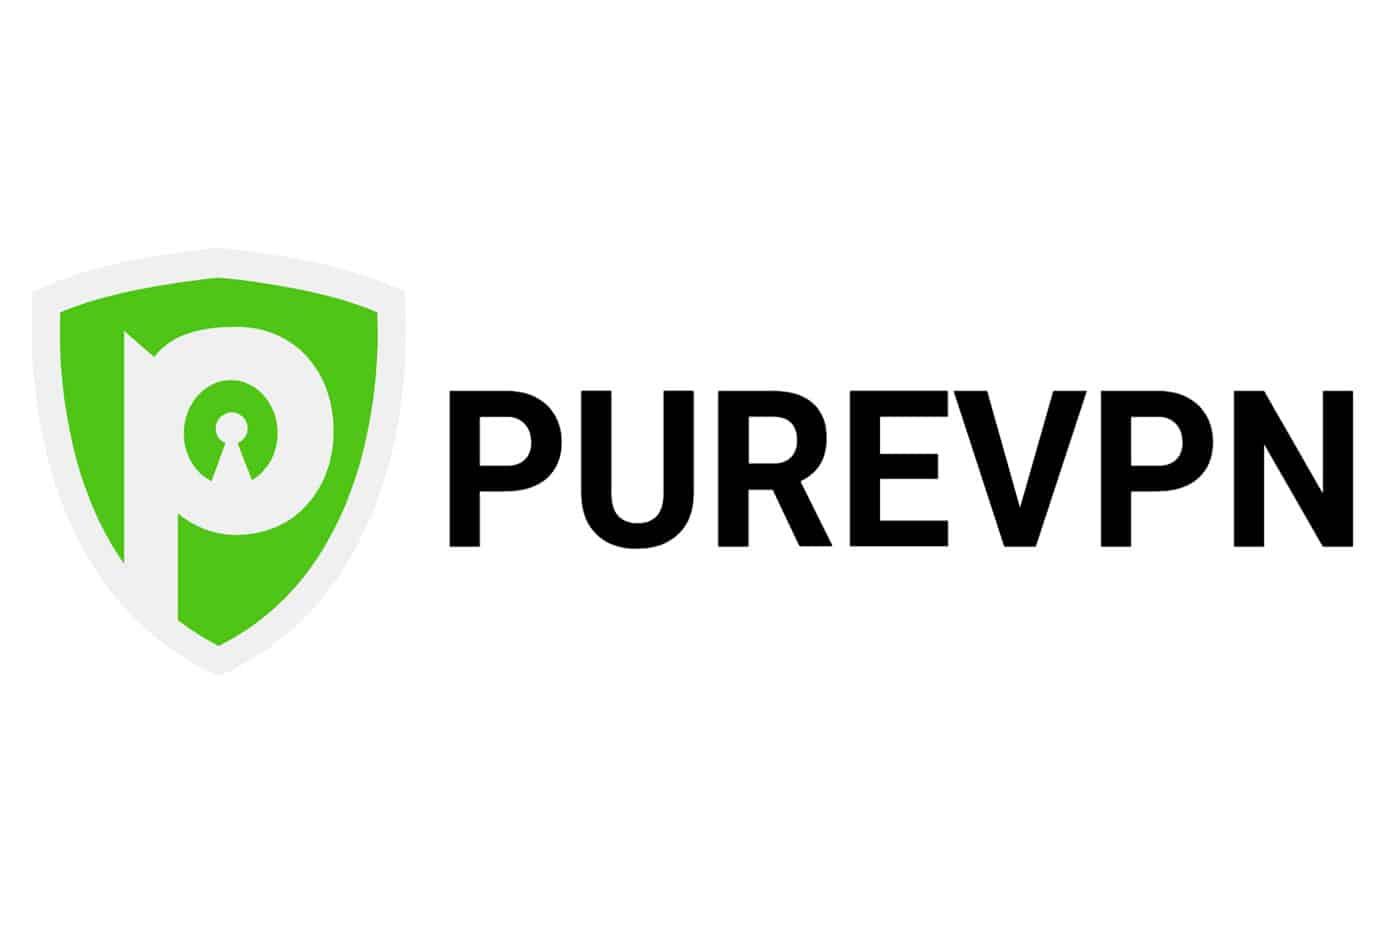 Le logo de PureVPN